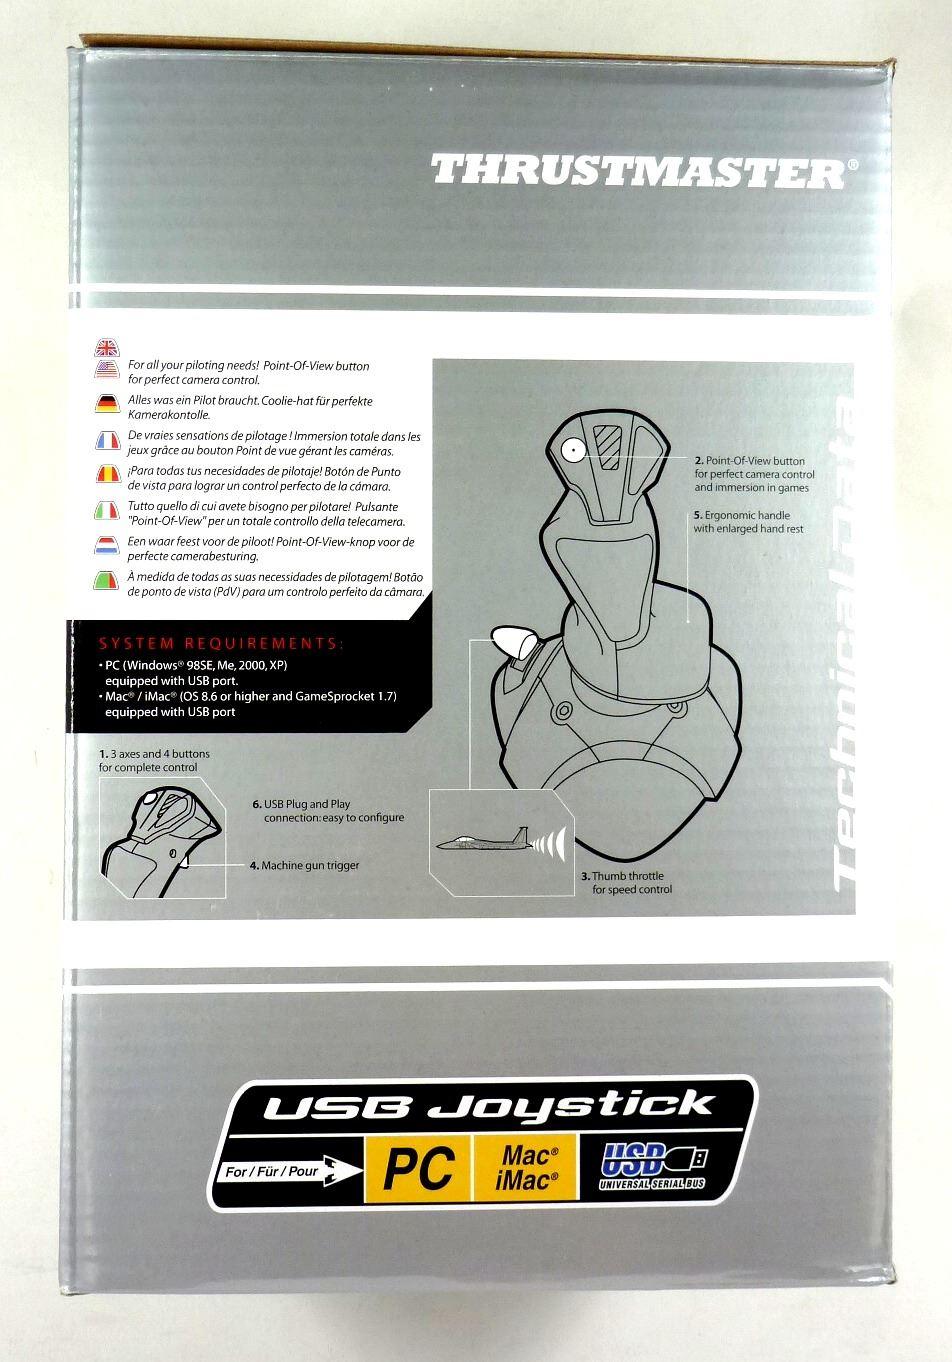 Ebay Thrustmaster USB Joystick For PC Mac Flight Machine Gun Trigger Game  POV Button